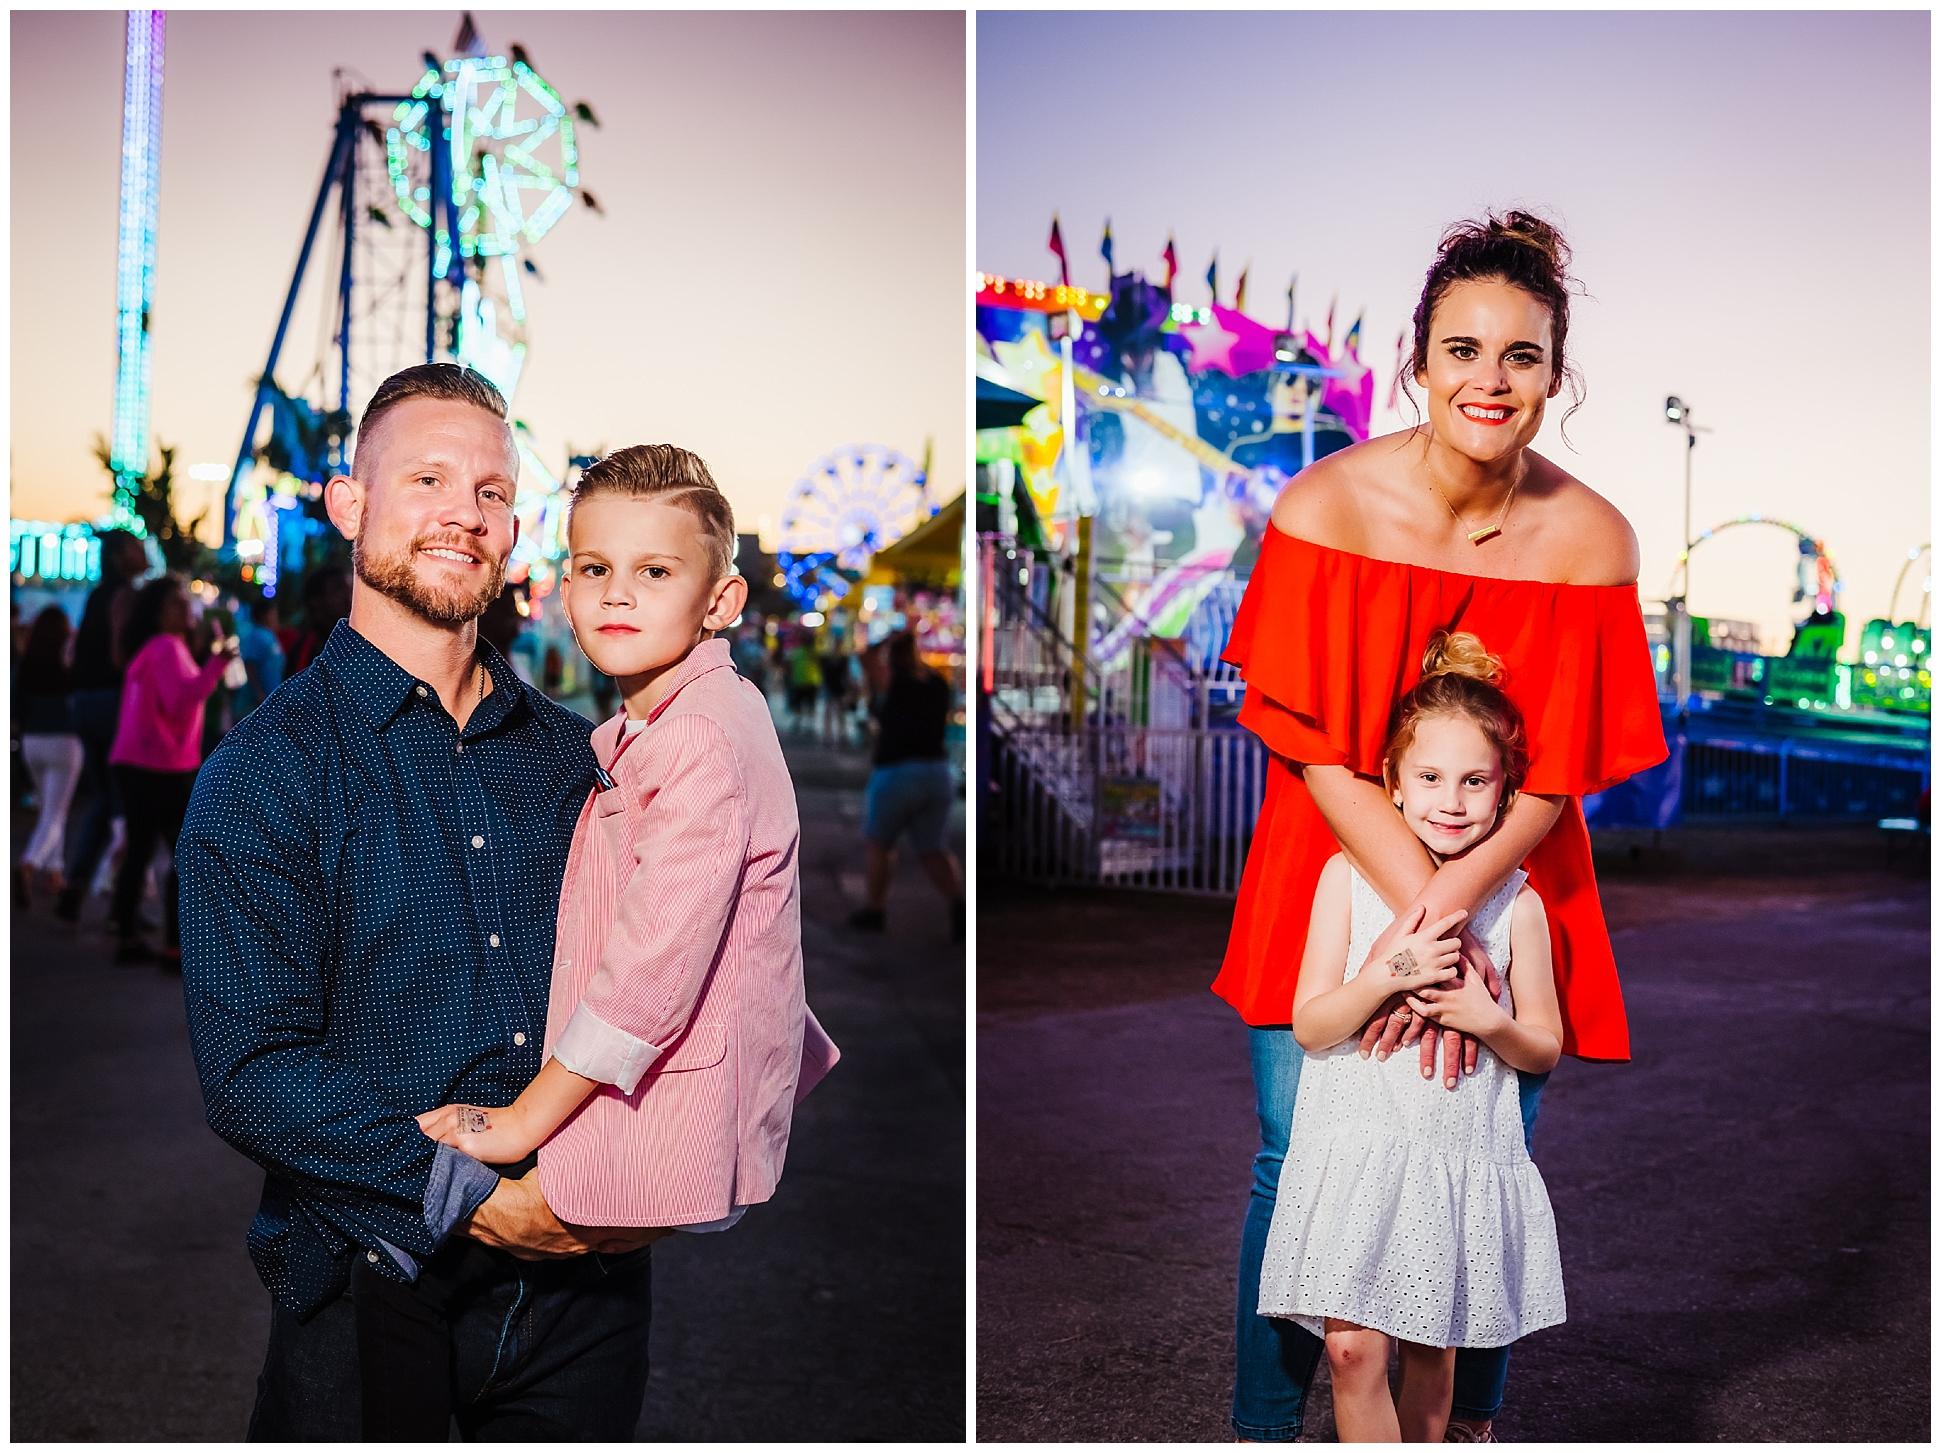 Tampa-colorful-fair-amusement park-family session_0043.jpg